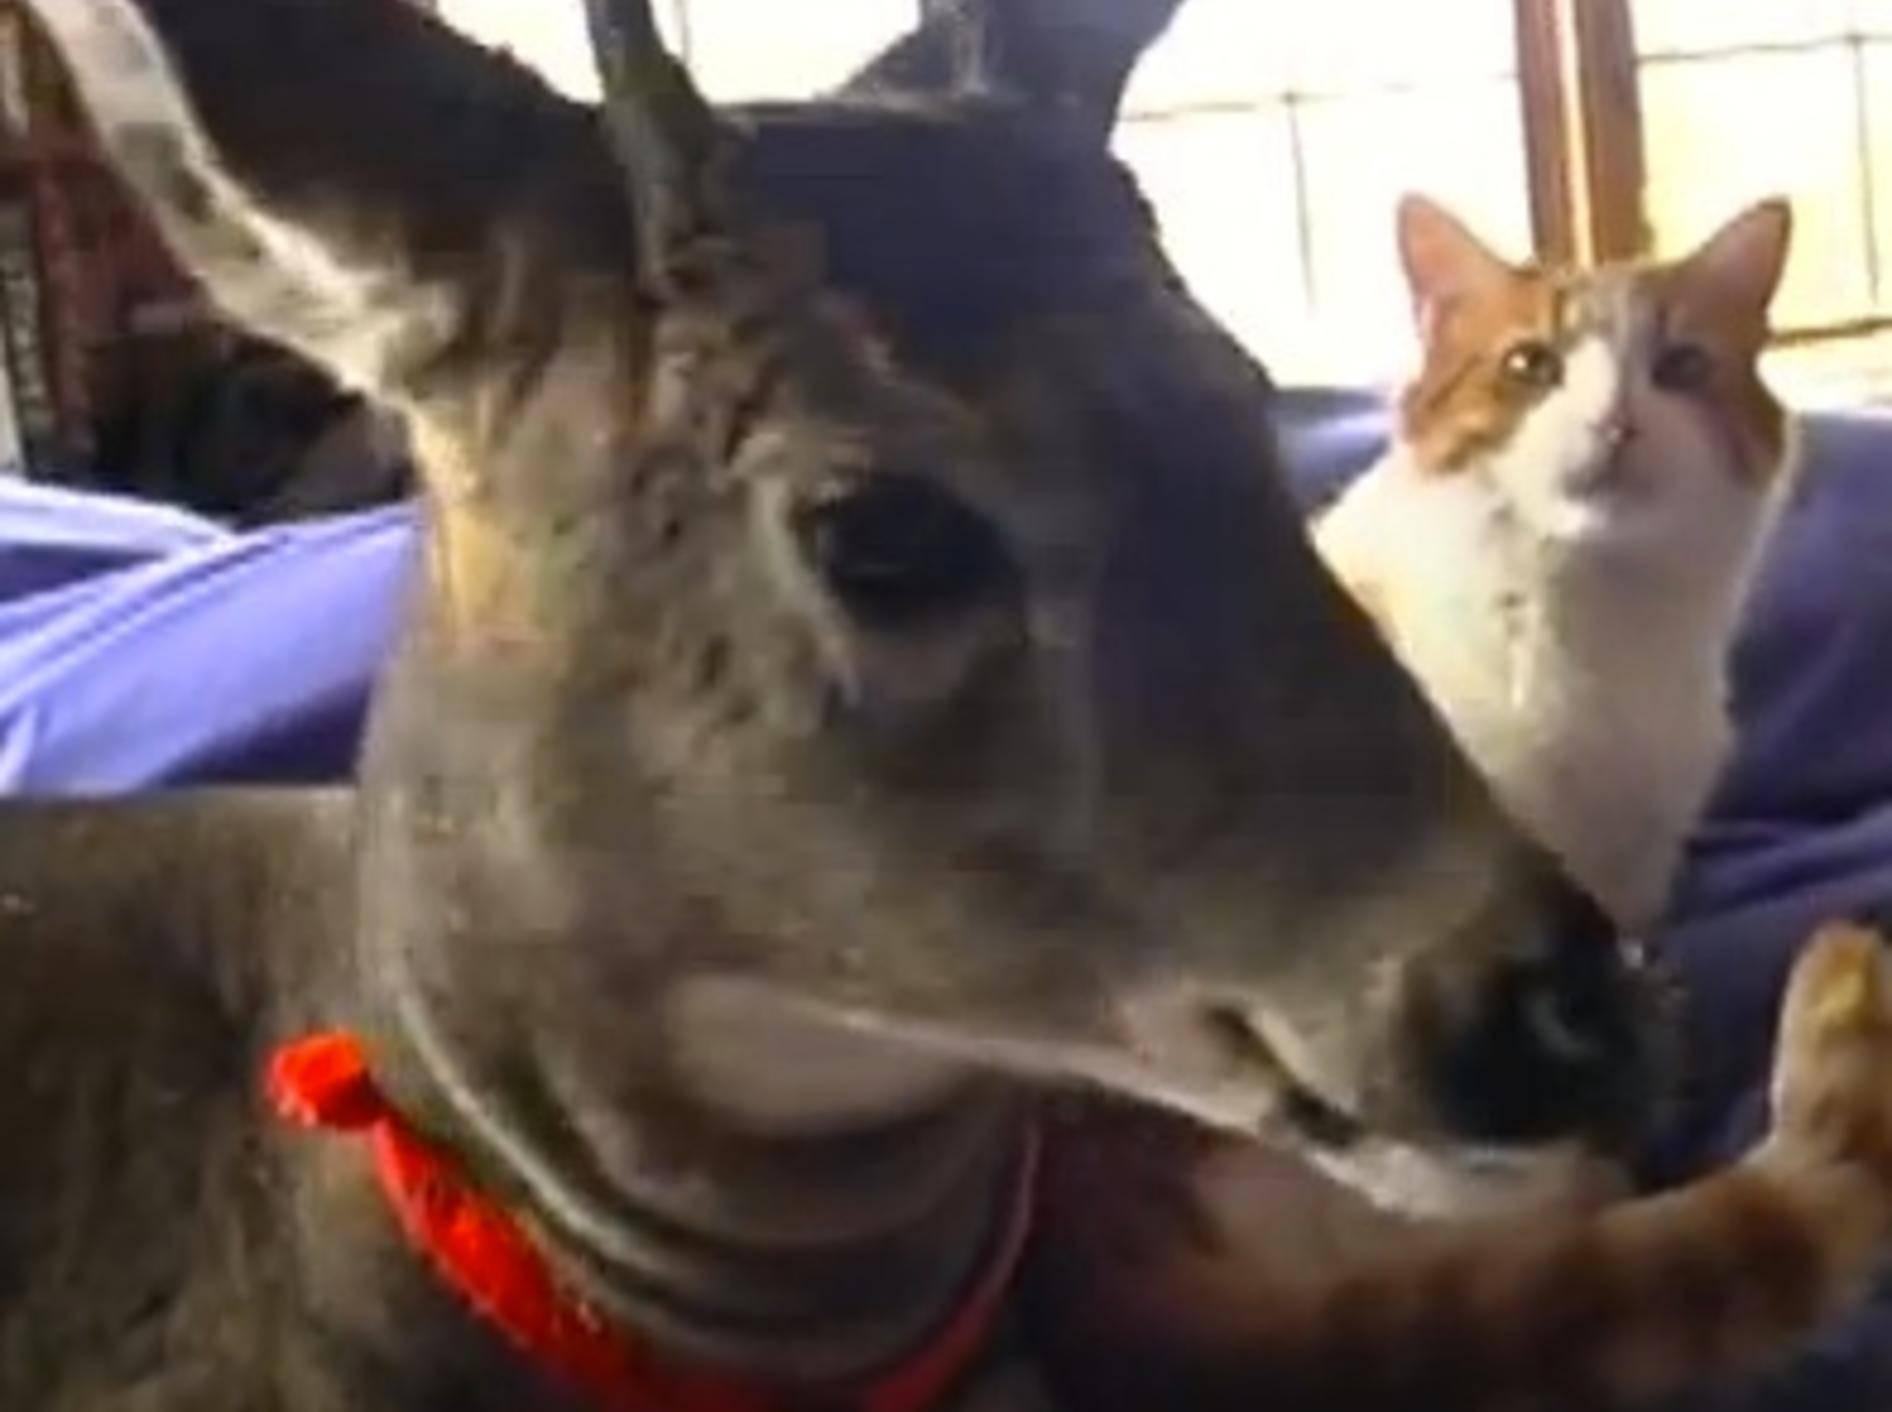 Liebe Katze kümmert sich um XXL-Waisentier – Bild: Youtube / hoppythedeer